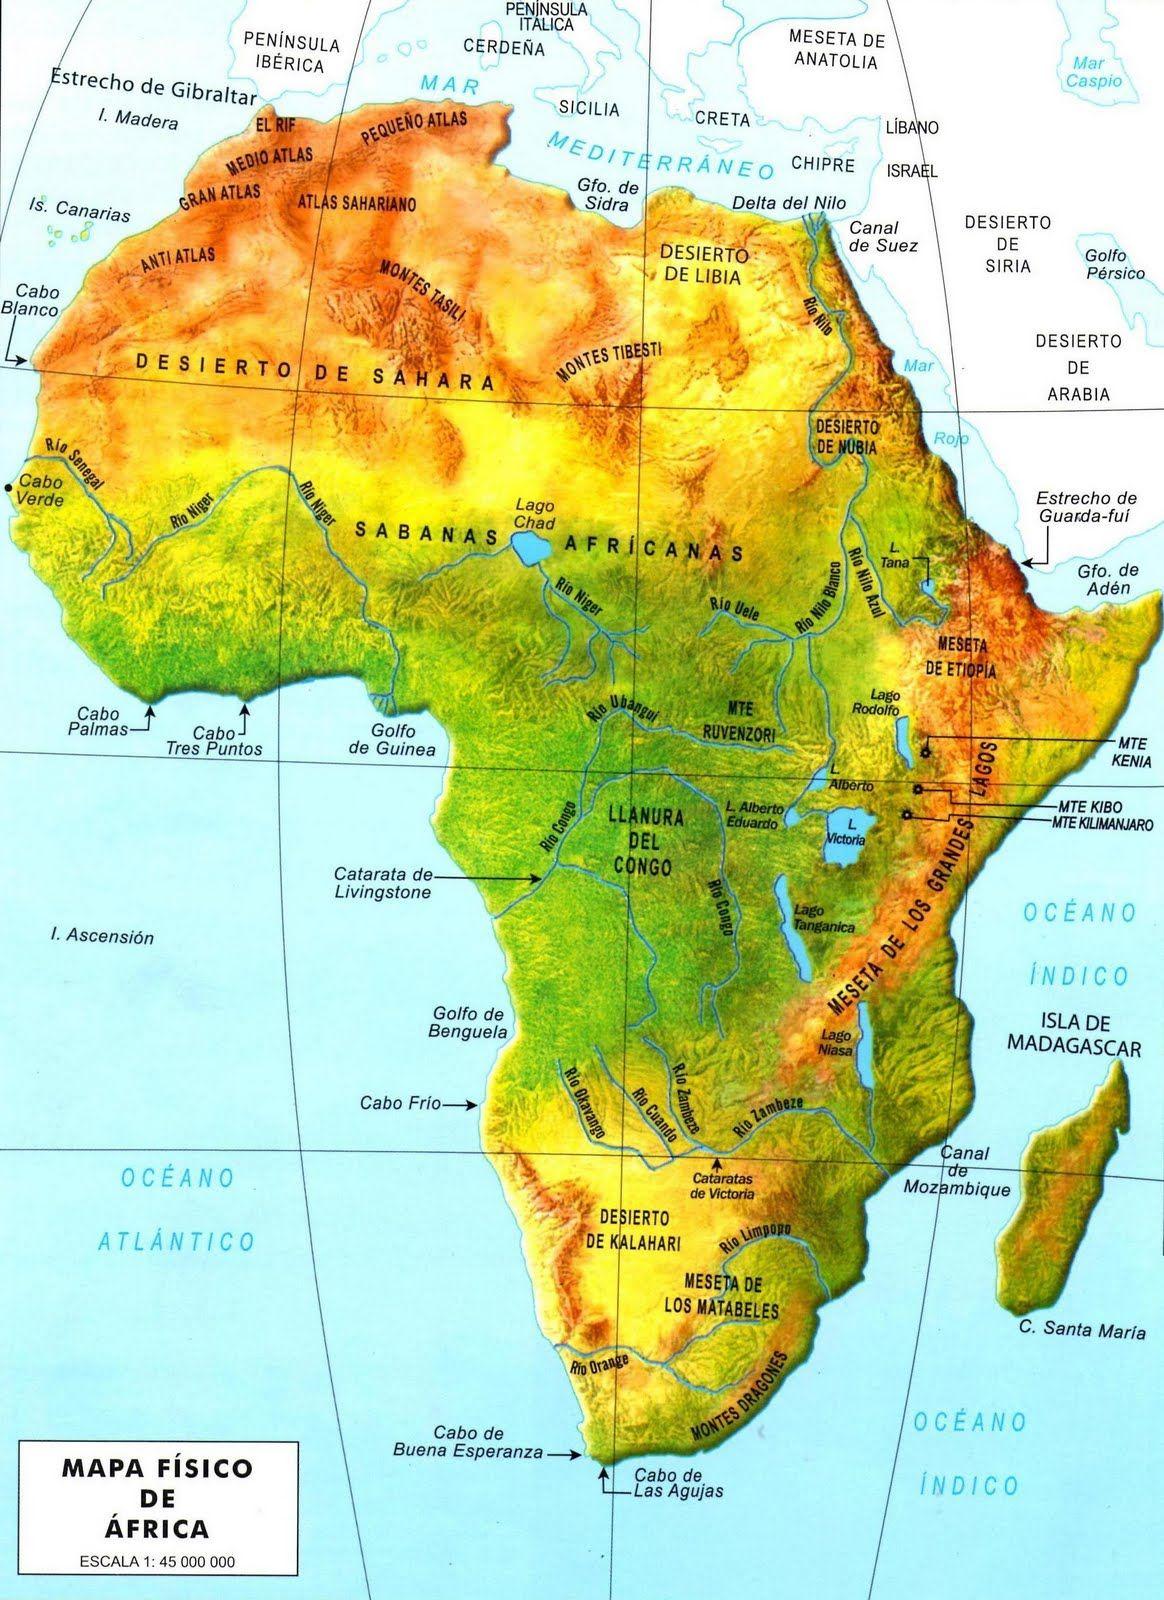 Canal De Suez Mapa Fisico Africa.Sur Del Rift Africano Buscar Con Google Africa Mapa